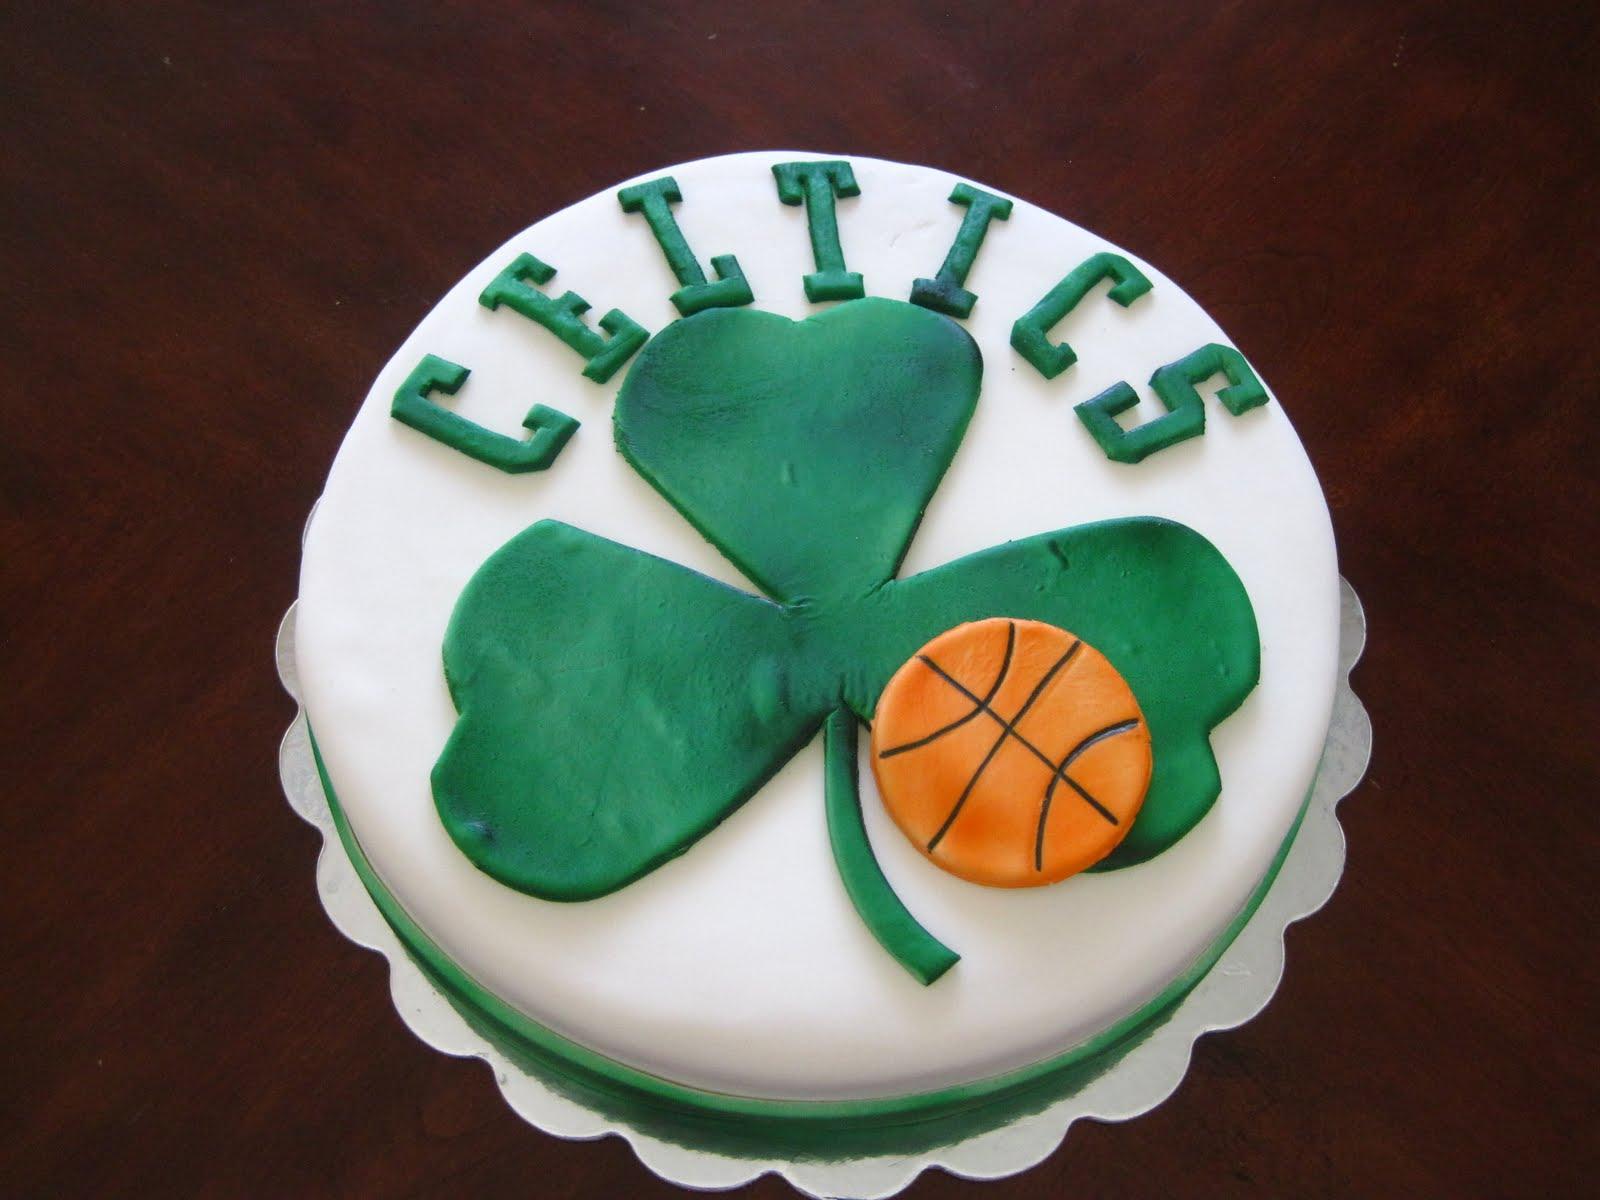 Megan S Creations Boston Celtics Cake And Headstone Grave